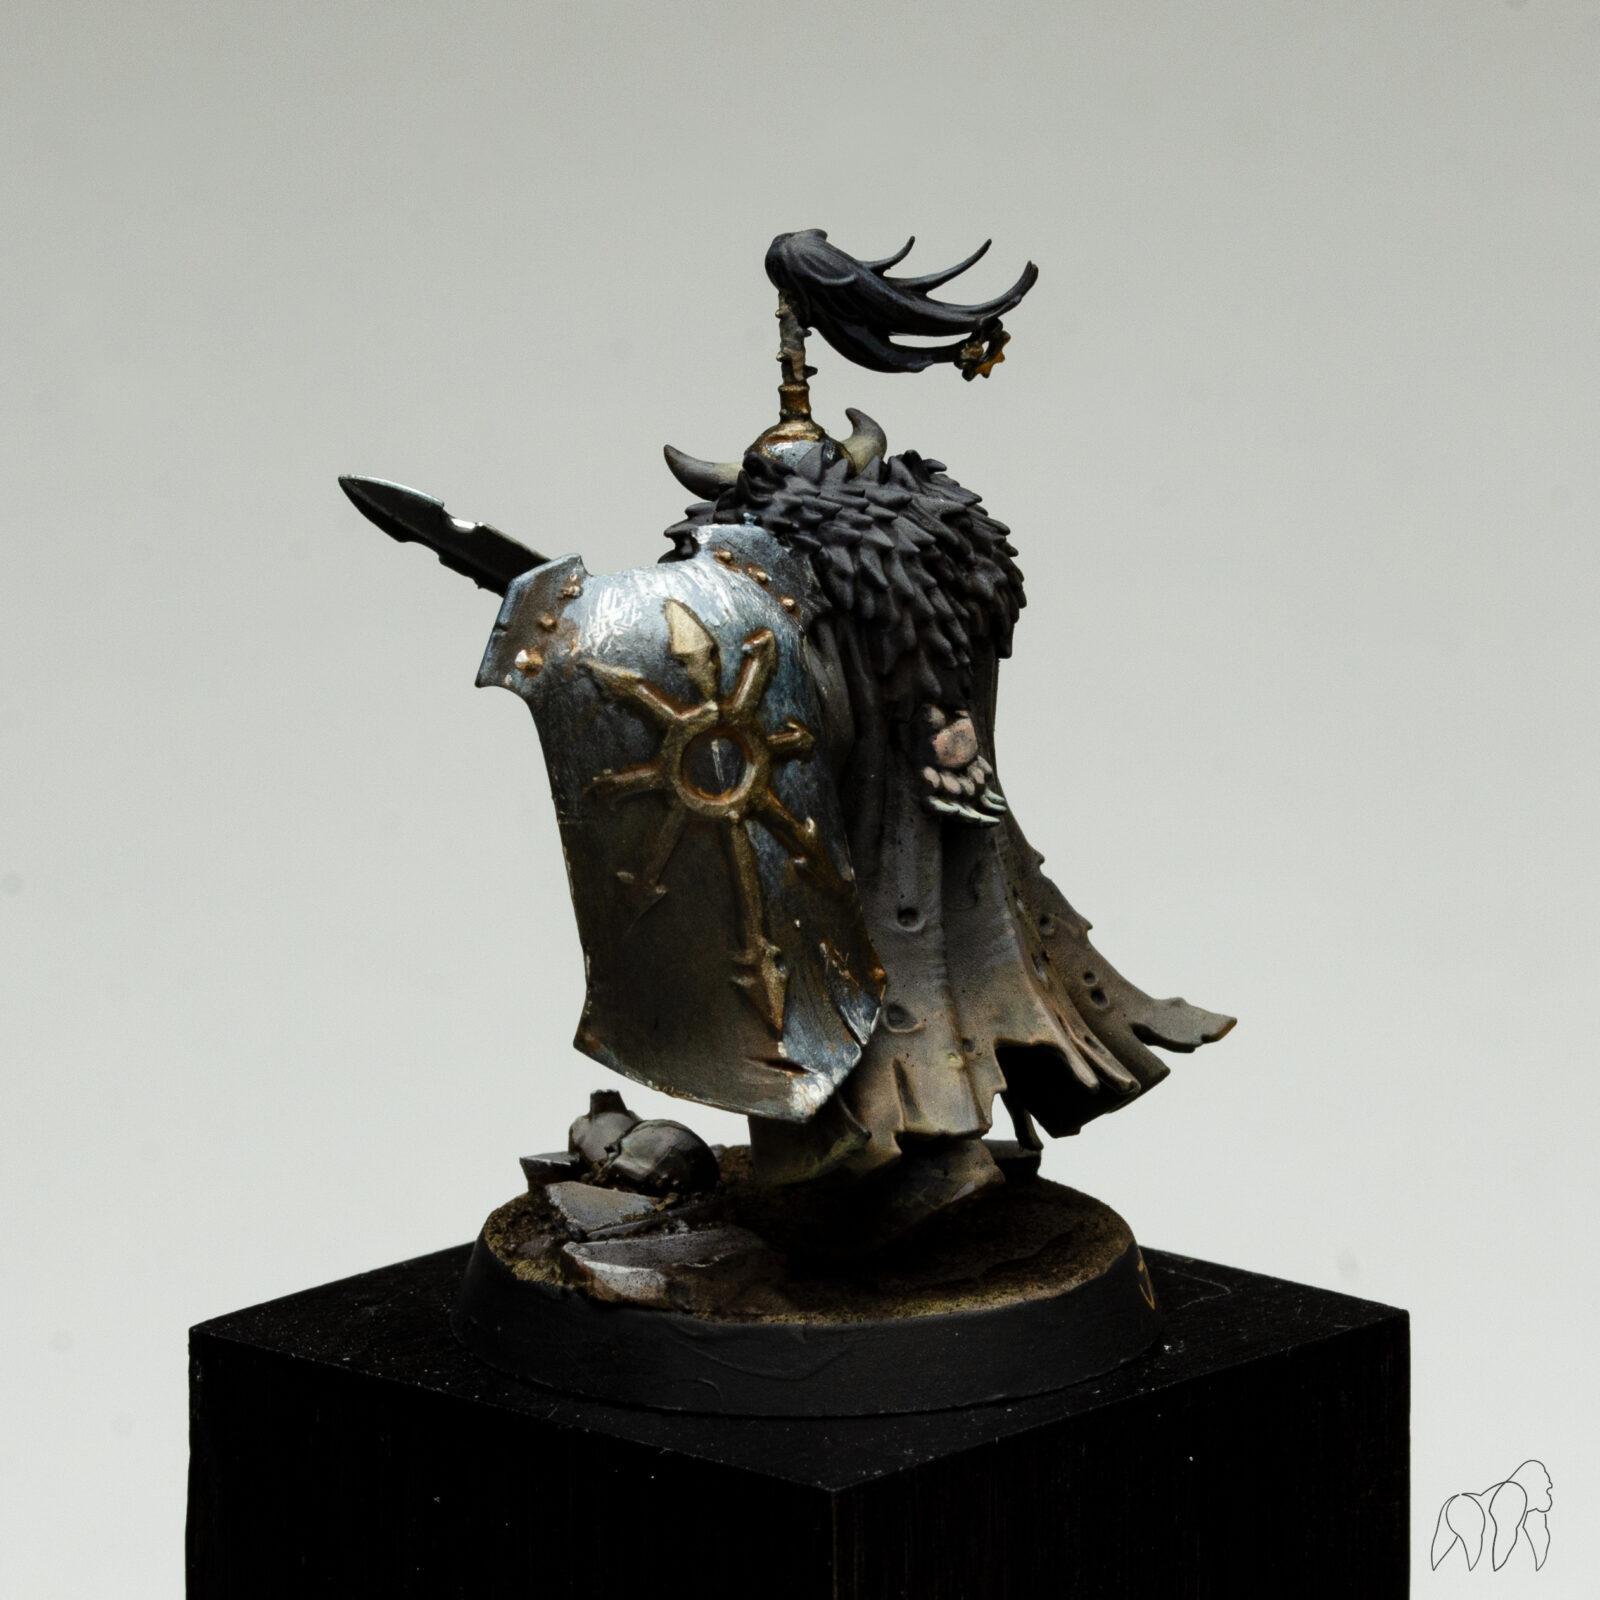 Chaoswarrior10